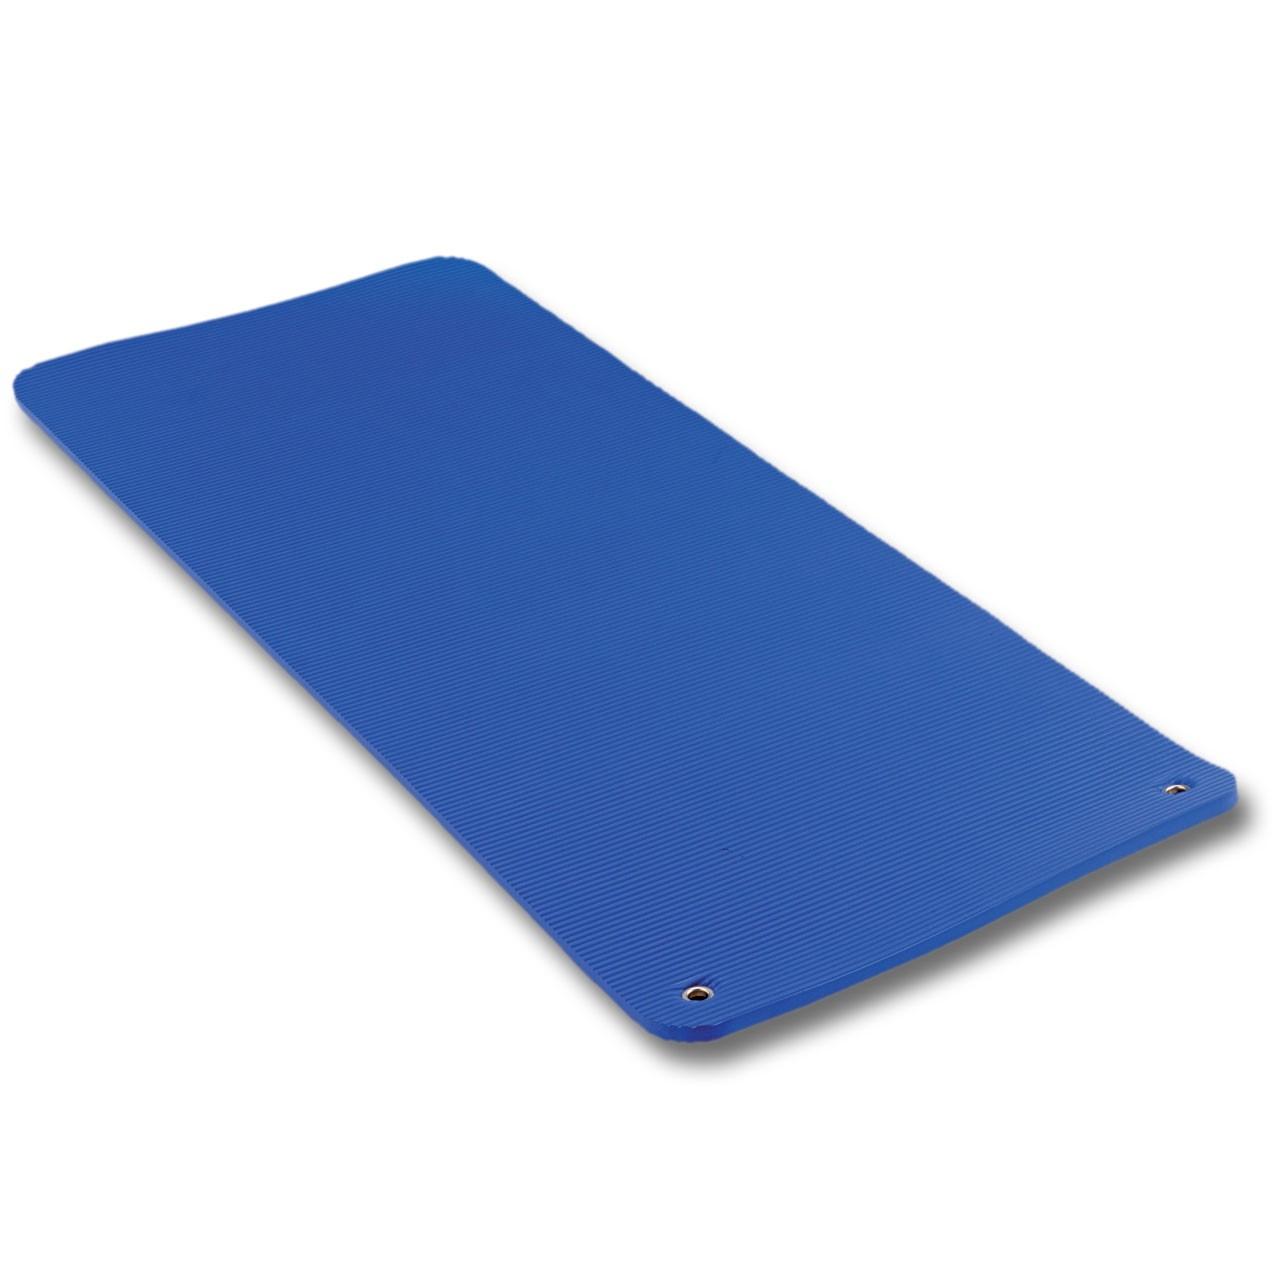 Podložka na cvičení TPE Profi 140 cm TUNTURI modrá